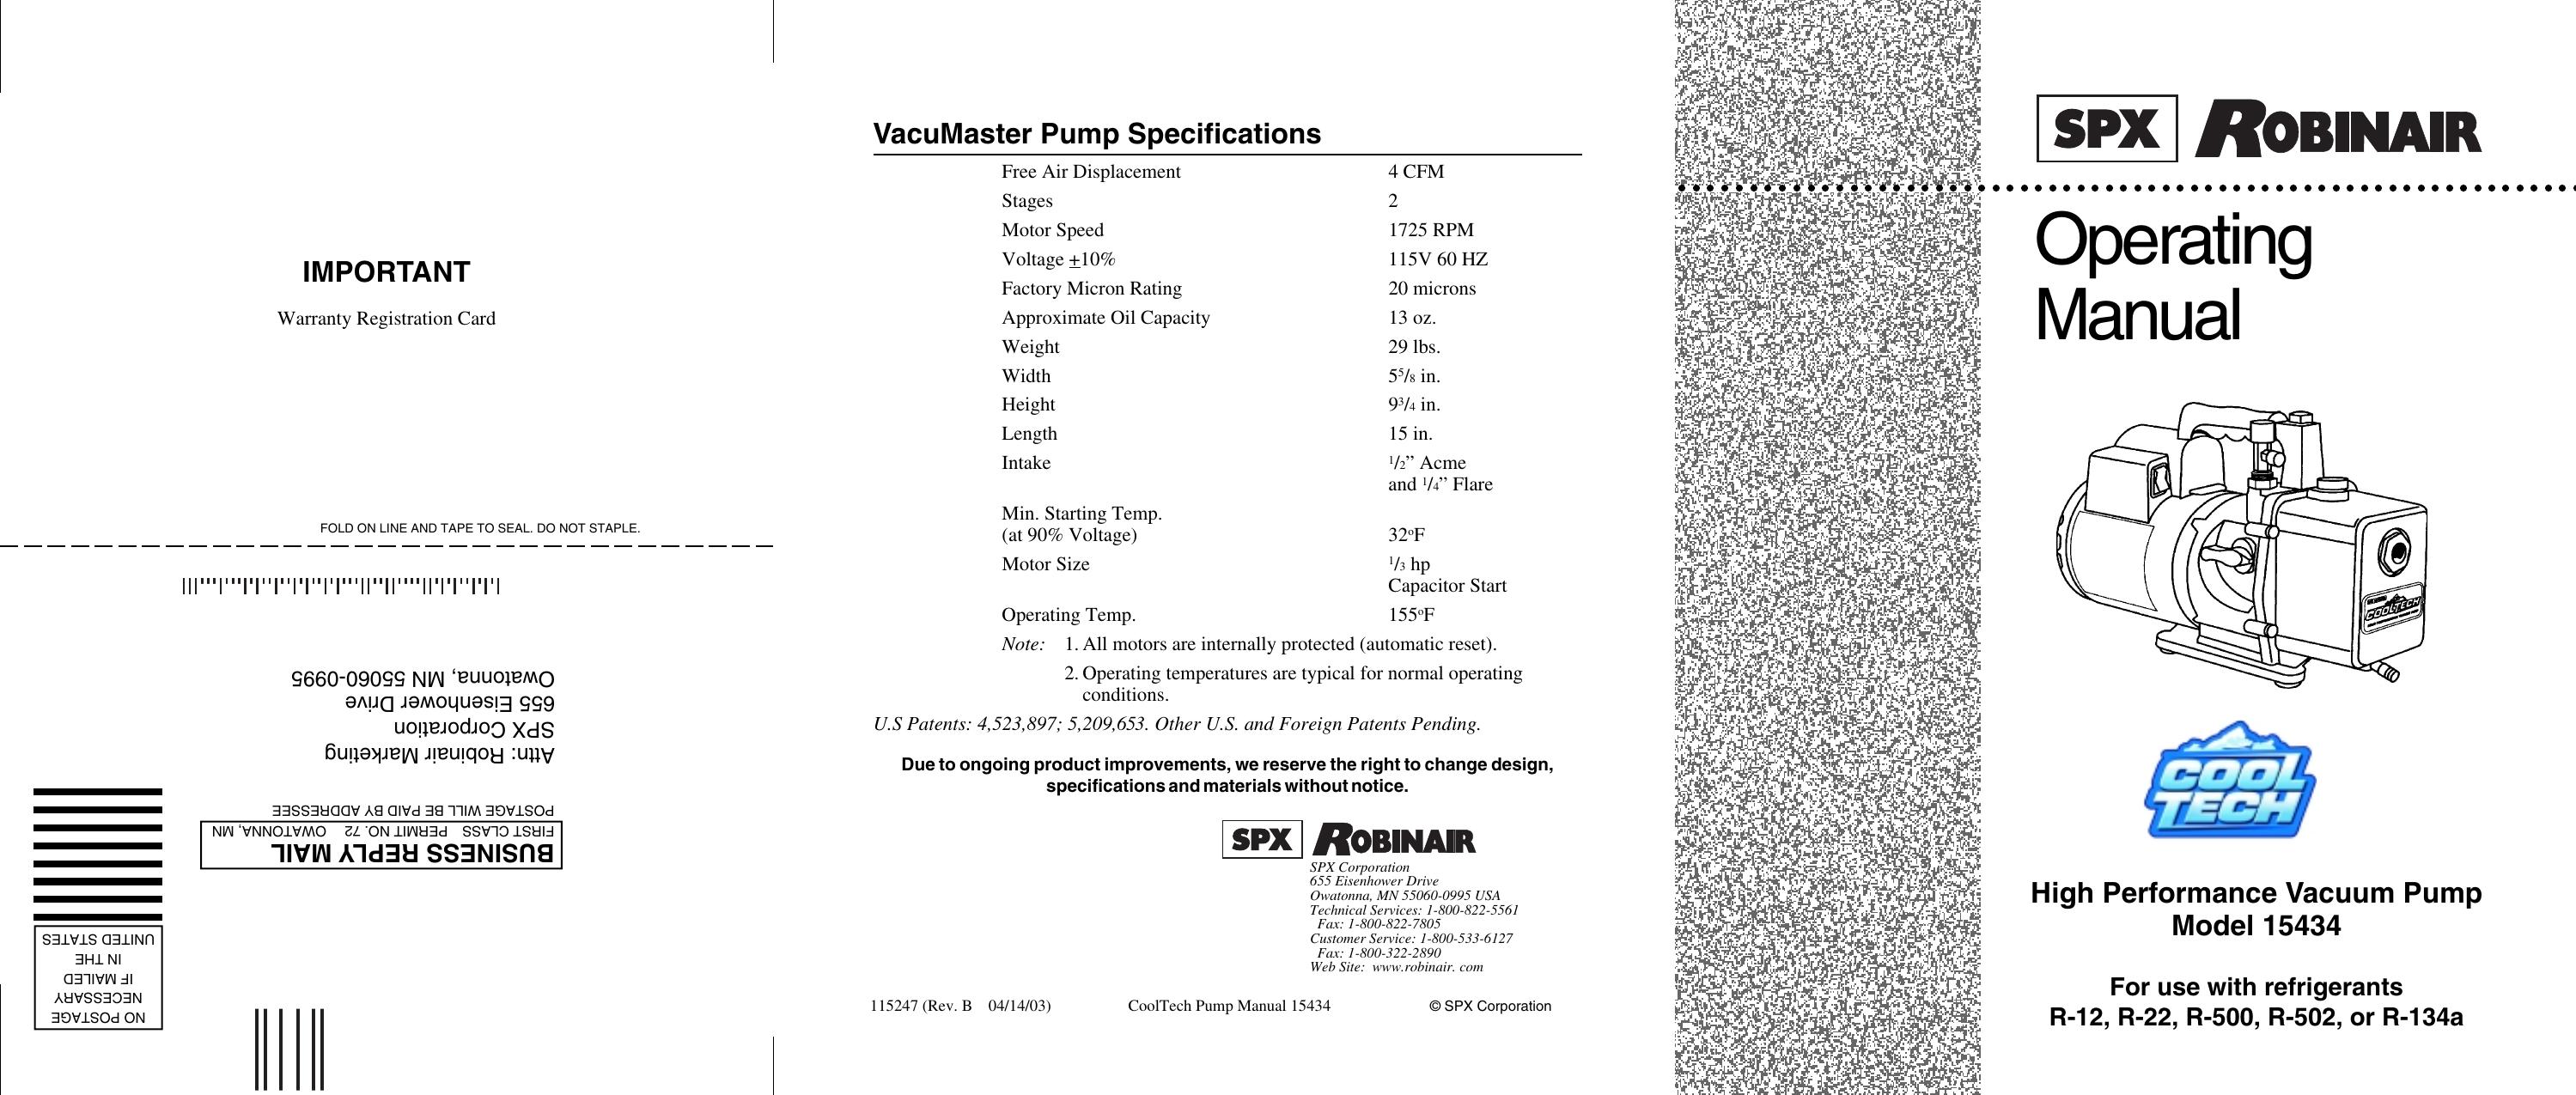 Robinair Cool Tech High Performance Vacuum Pump 15434 Users Manual Ac Unit Wiring Diagram 110973 15400 15600